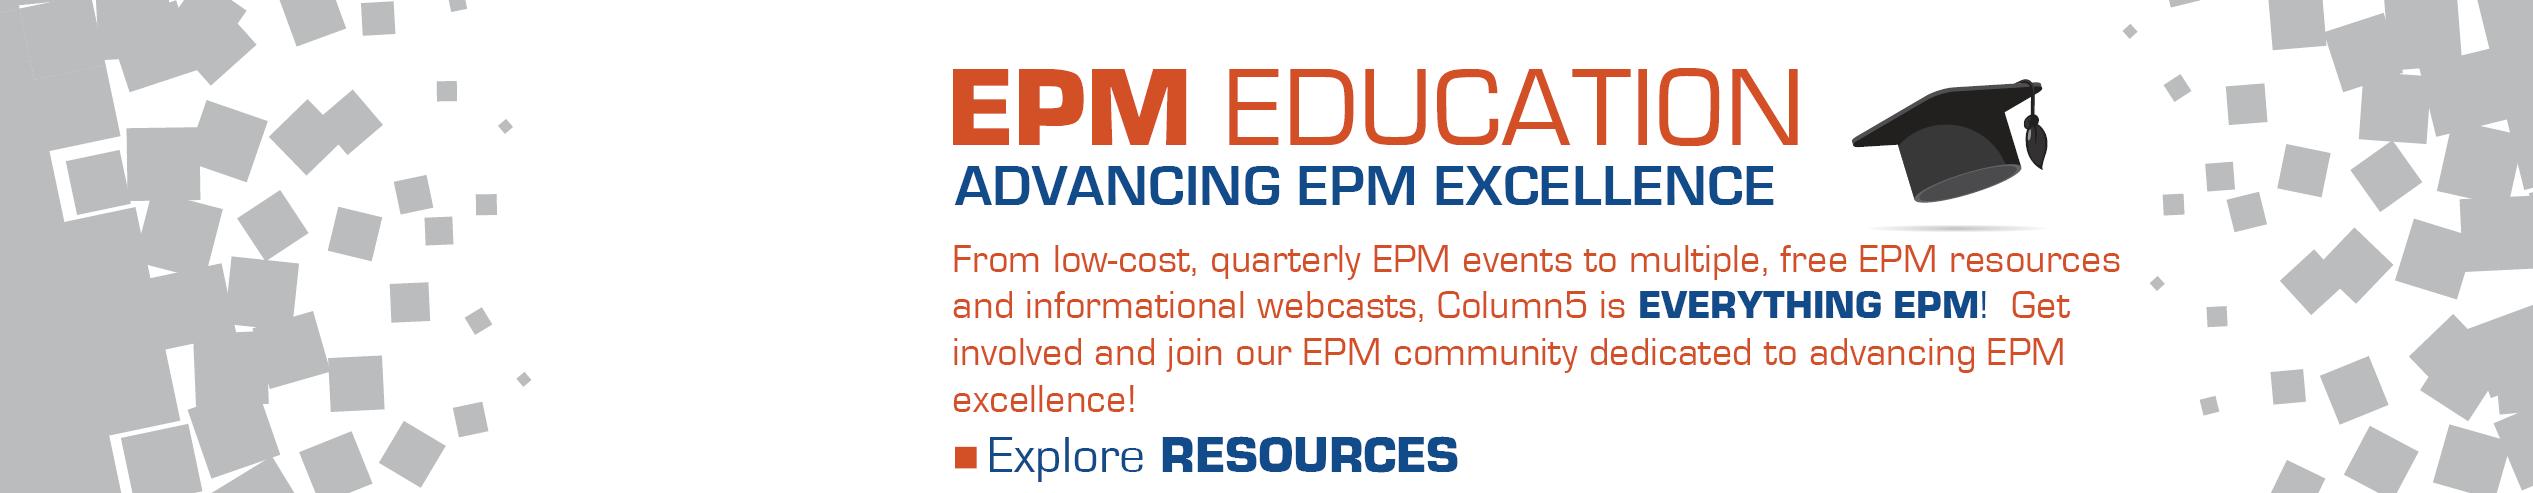 Explore EPM Resources!